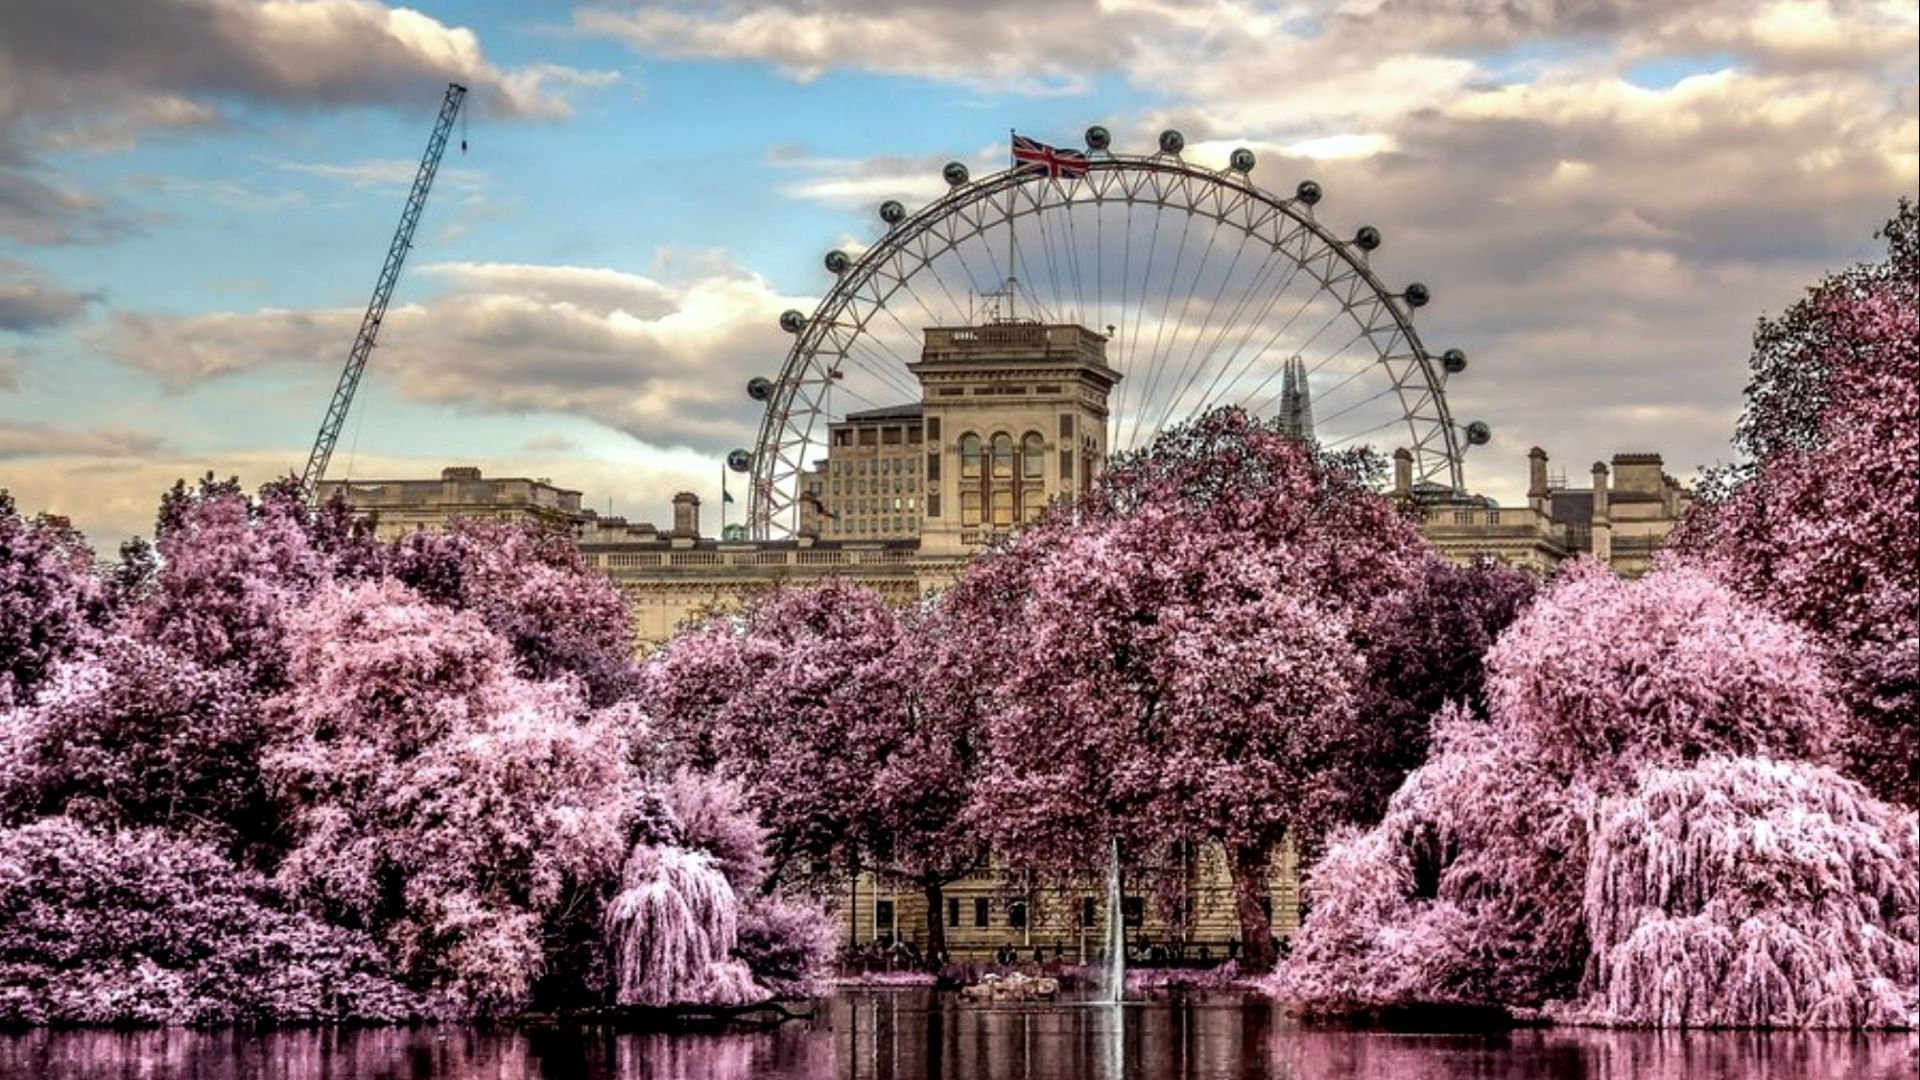 Great Wallpaper Macbook London - London-UK-Wallpaper-31-1920x1080  Trends_511434.jpg